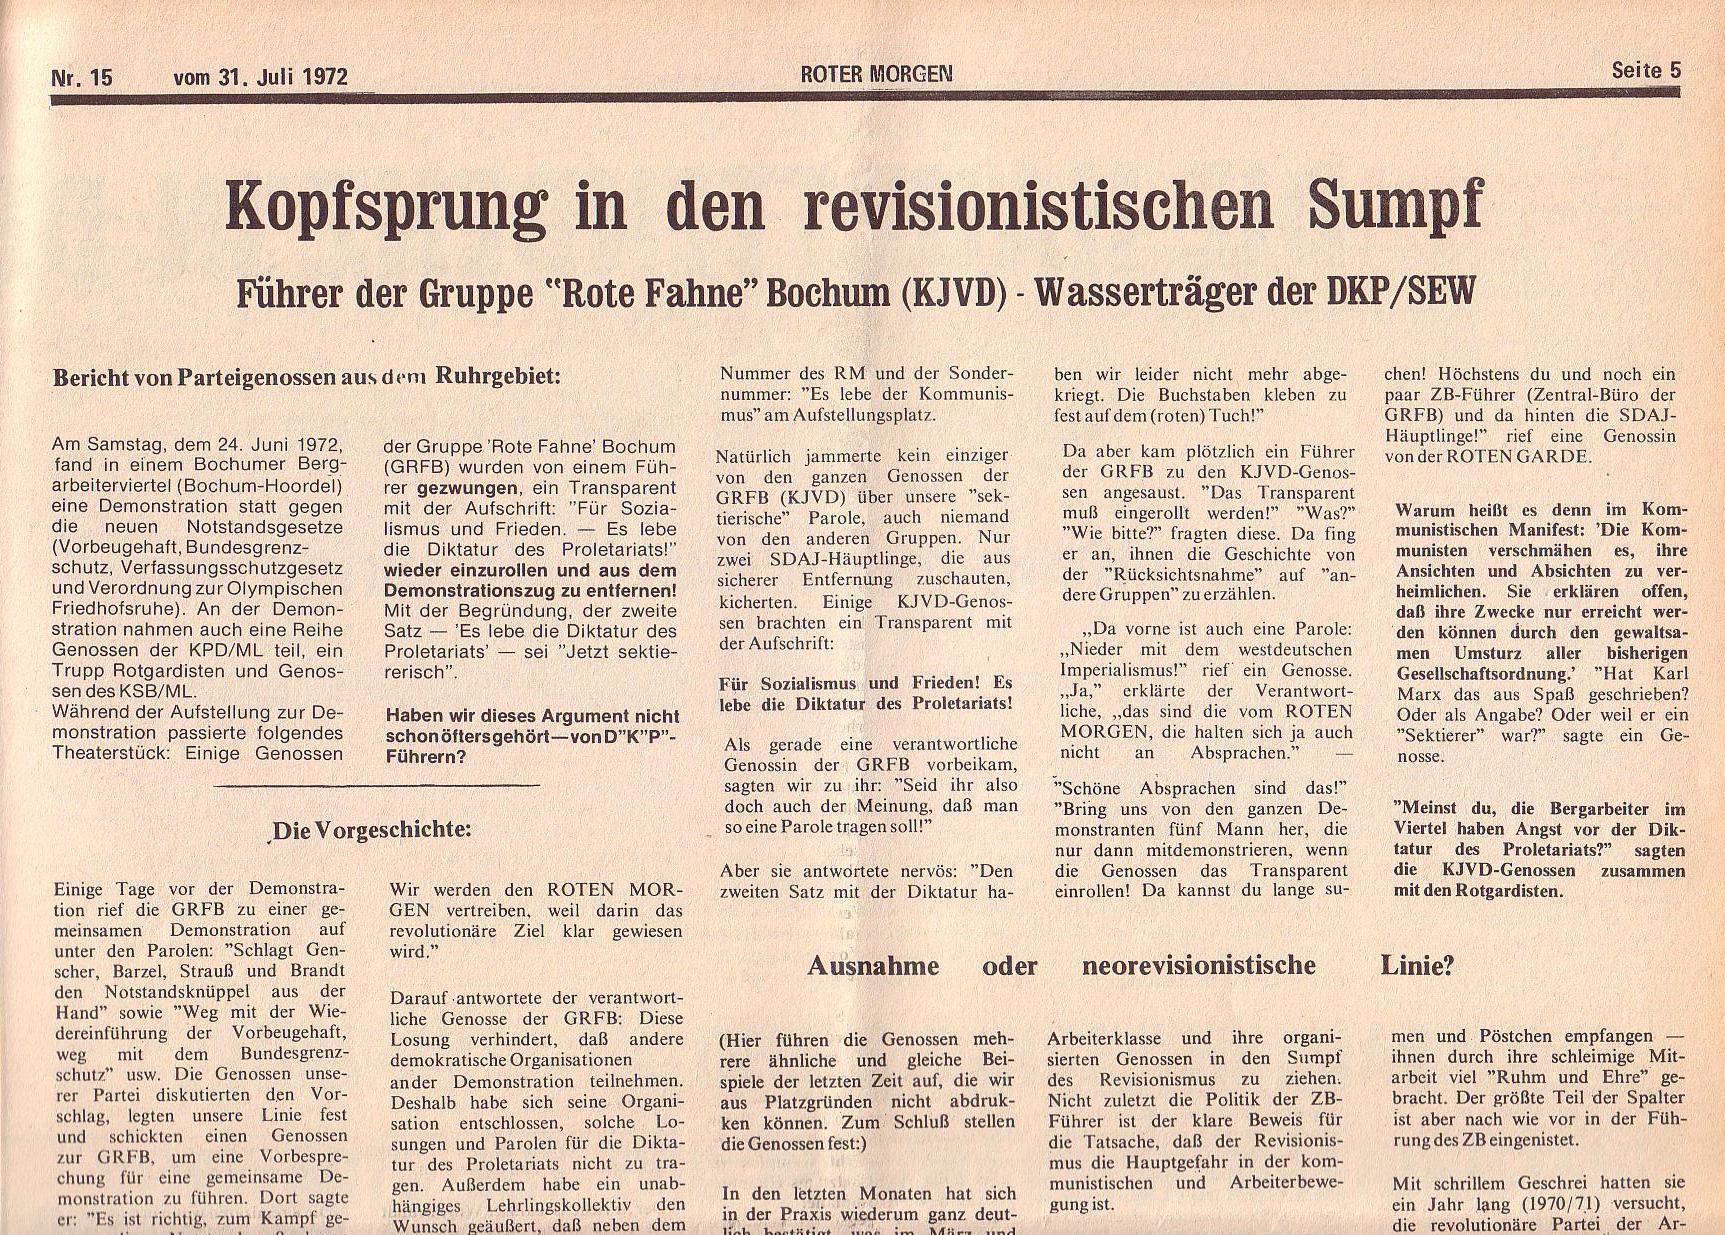 Roter Morgen, 6. Jg., 31. Juli 1972, Nr. 15, Seite 5a